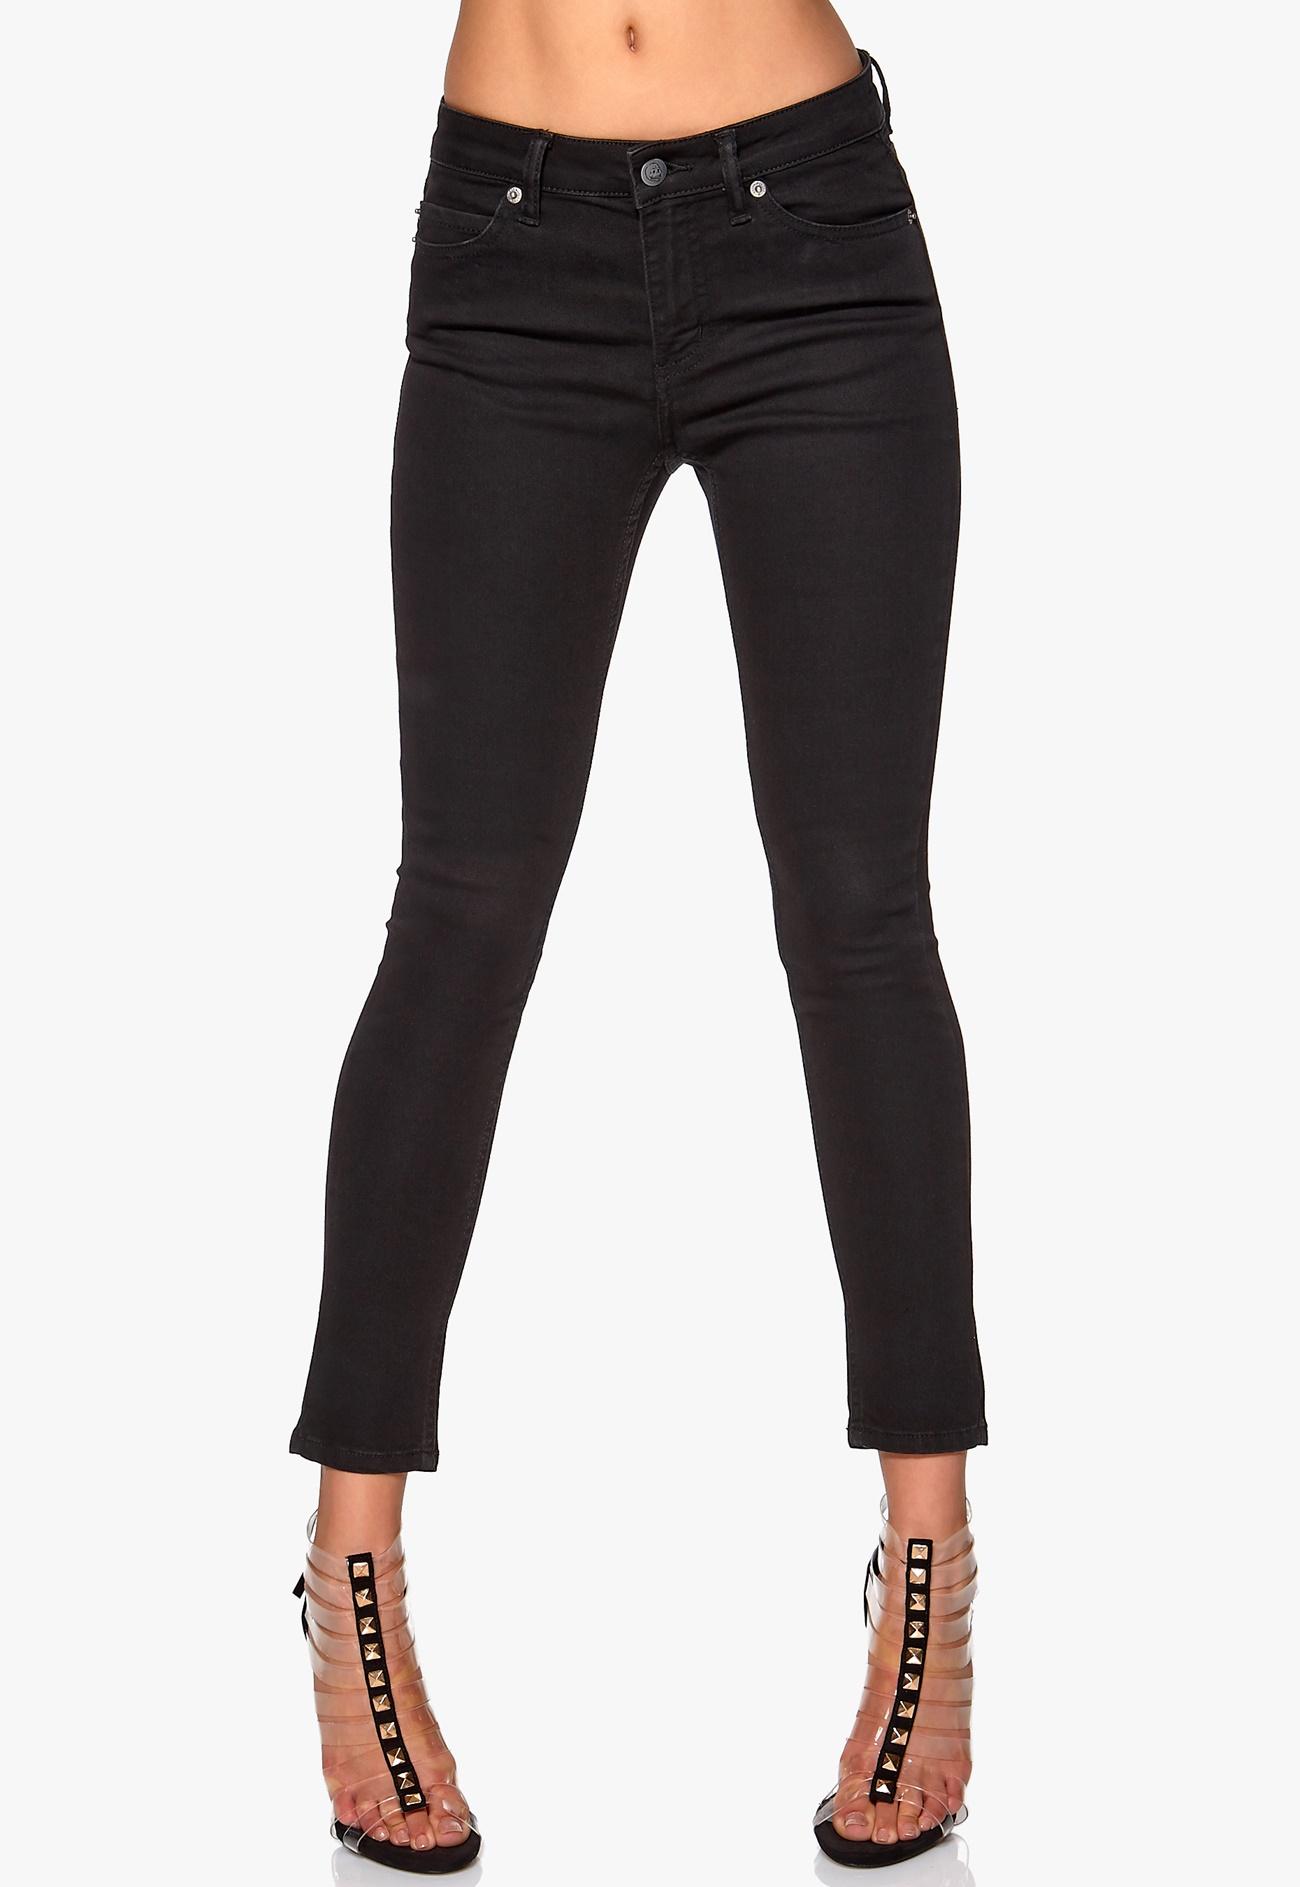 CHEAP MONDAY Prime Cropped Jeans Pitch Black - Bubbleroom